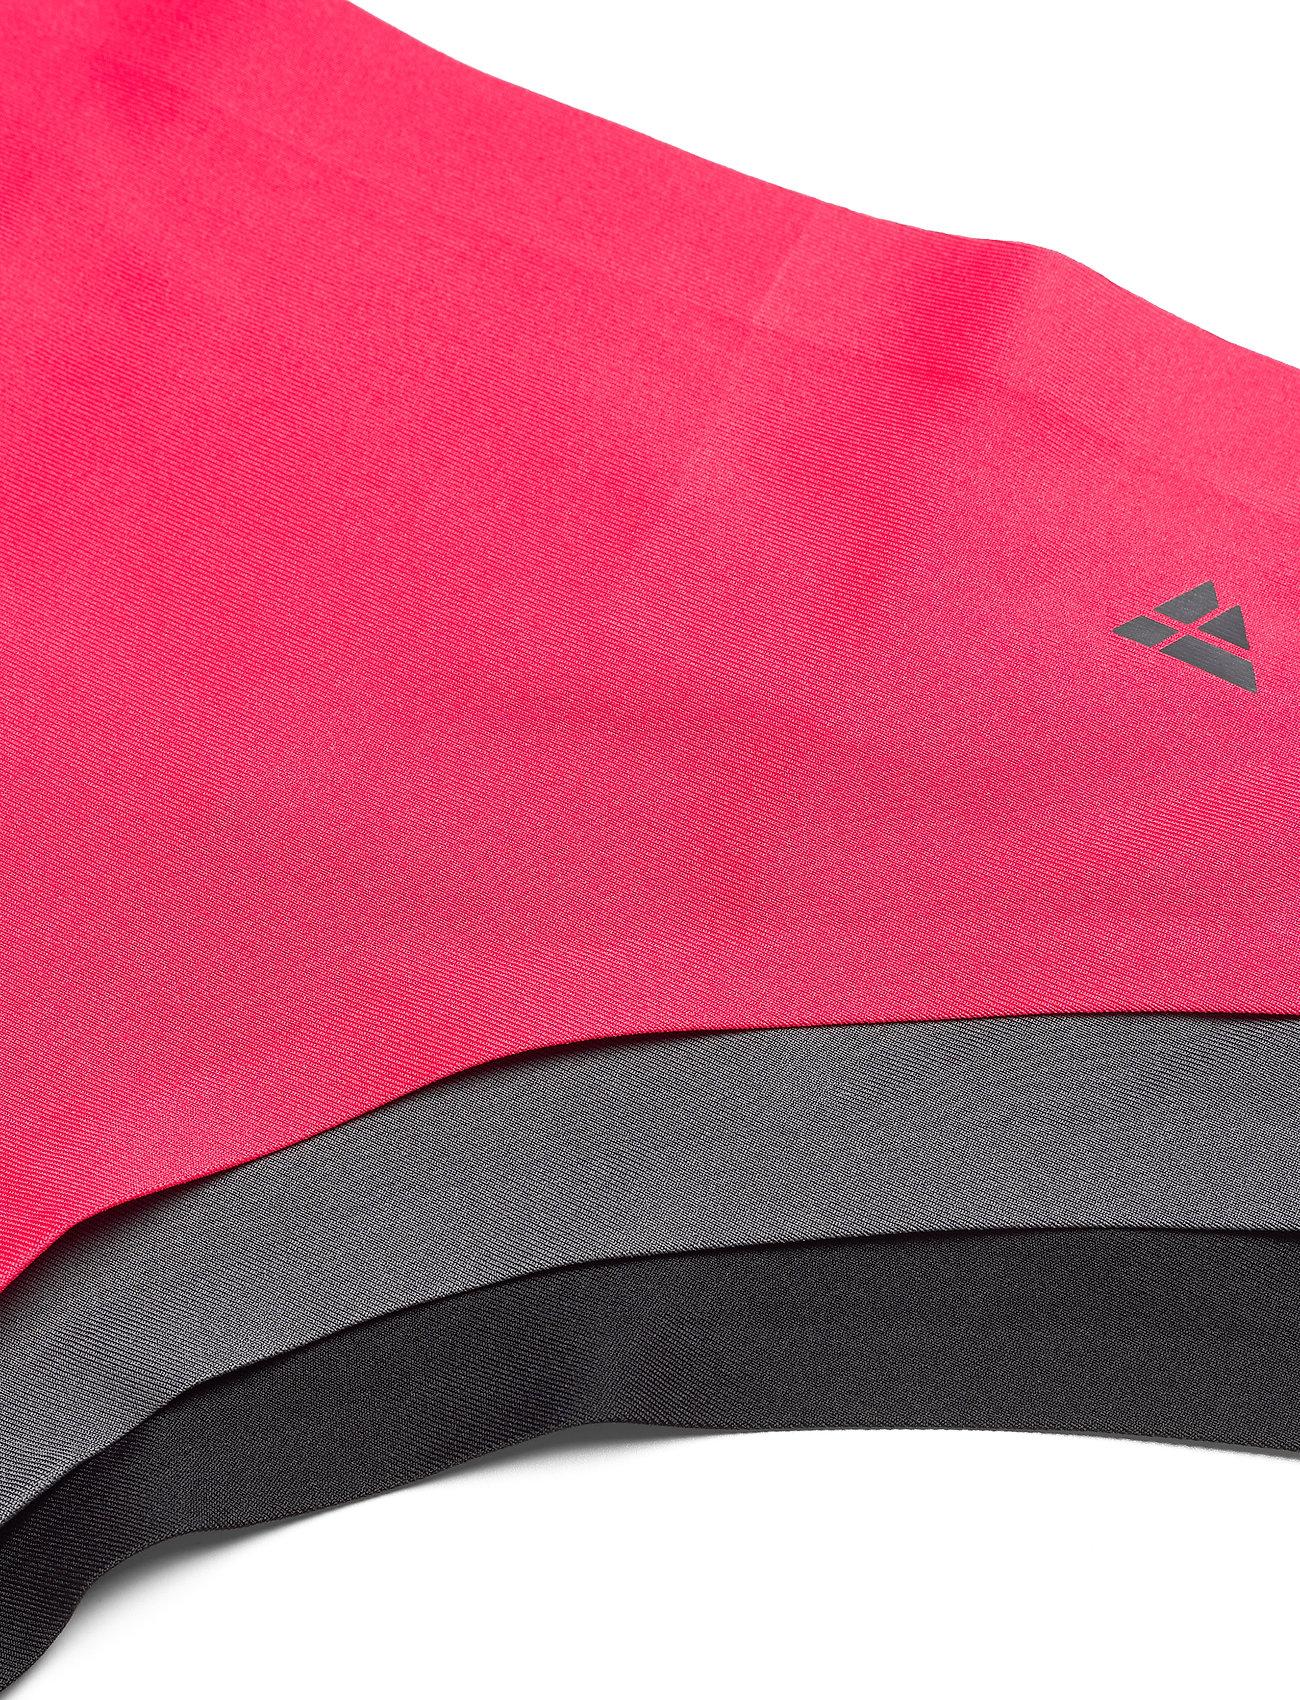 Danish Endurance - Microfiber Thong 3 Pack - slips - multicolor (1 x black, 1 x grey, 1 x pink) - 1